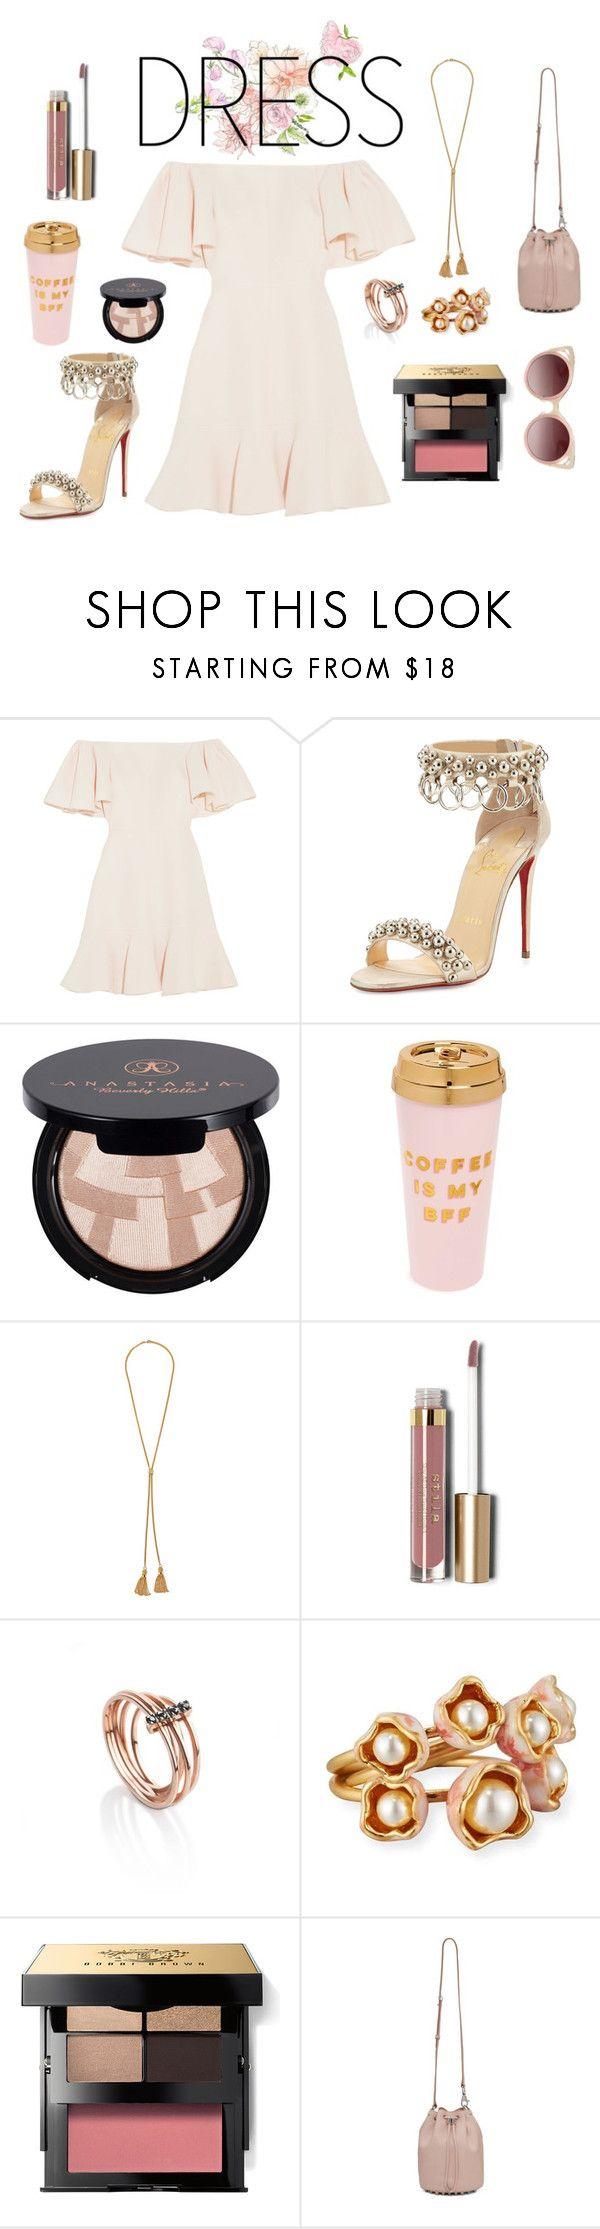 """blushing"" by lanagur on Polyvore featuring мода, Valentino, Christian Louboutin, Anastasia Beverly Hills, ban.do, Chloé, Stila, MyriamSOS, Tory Burch и Bobbi Brown Cosmetics"